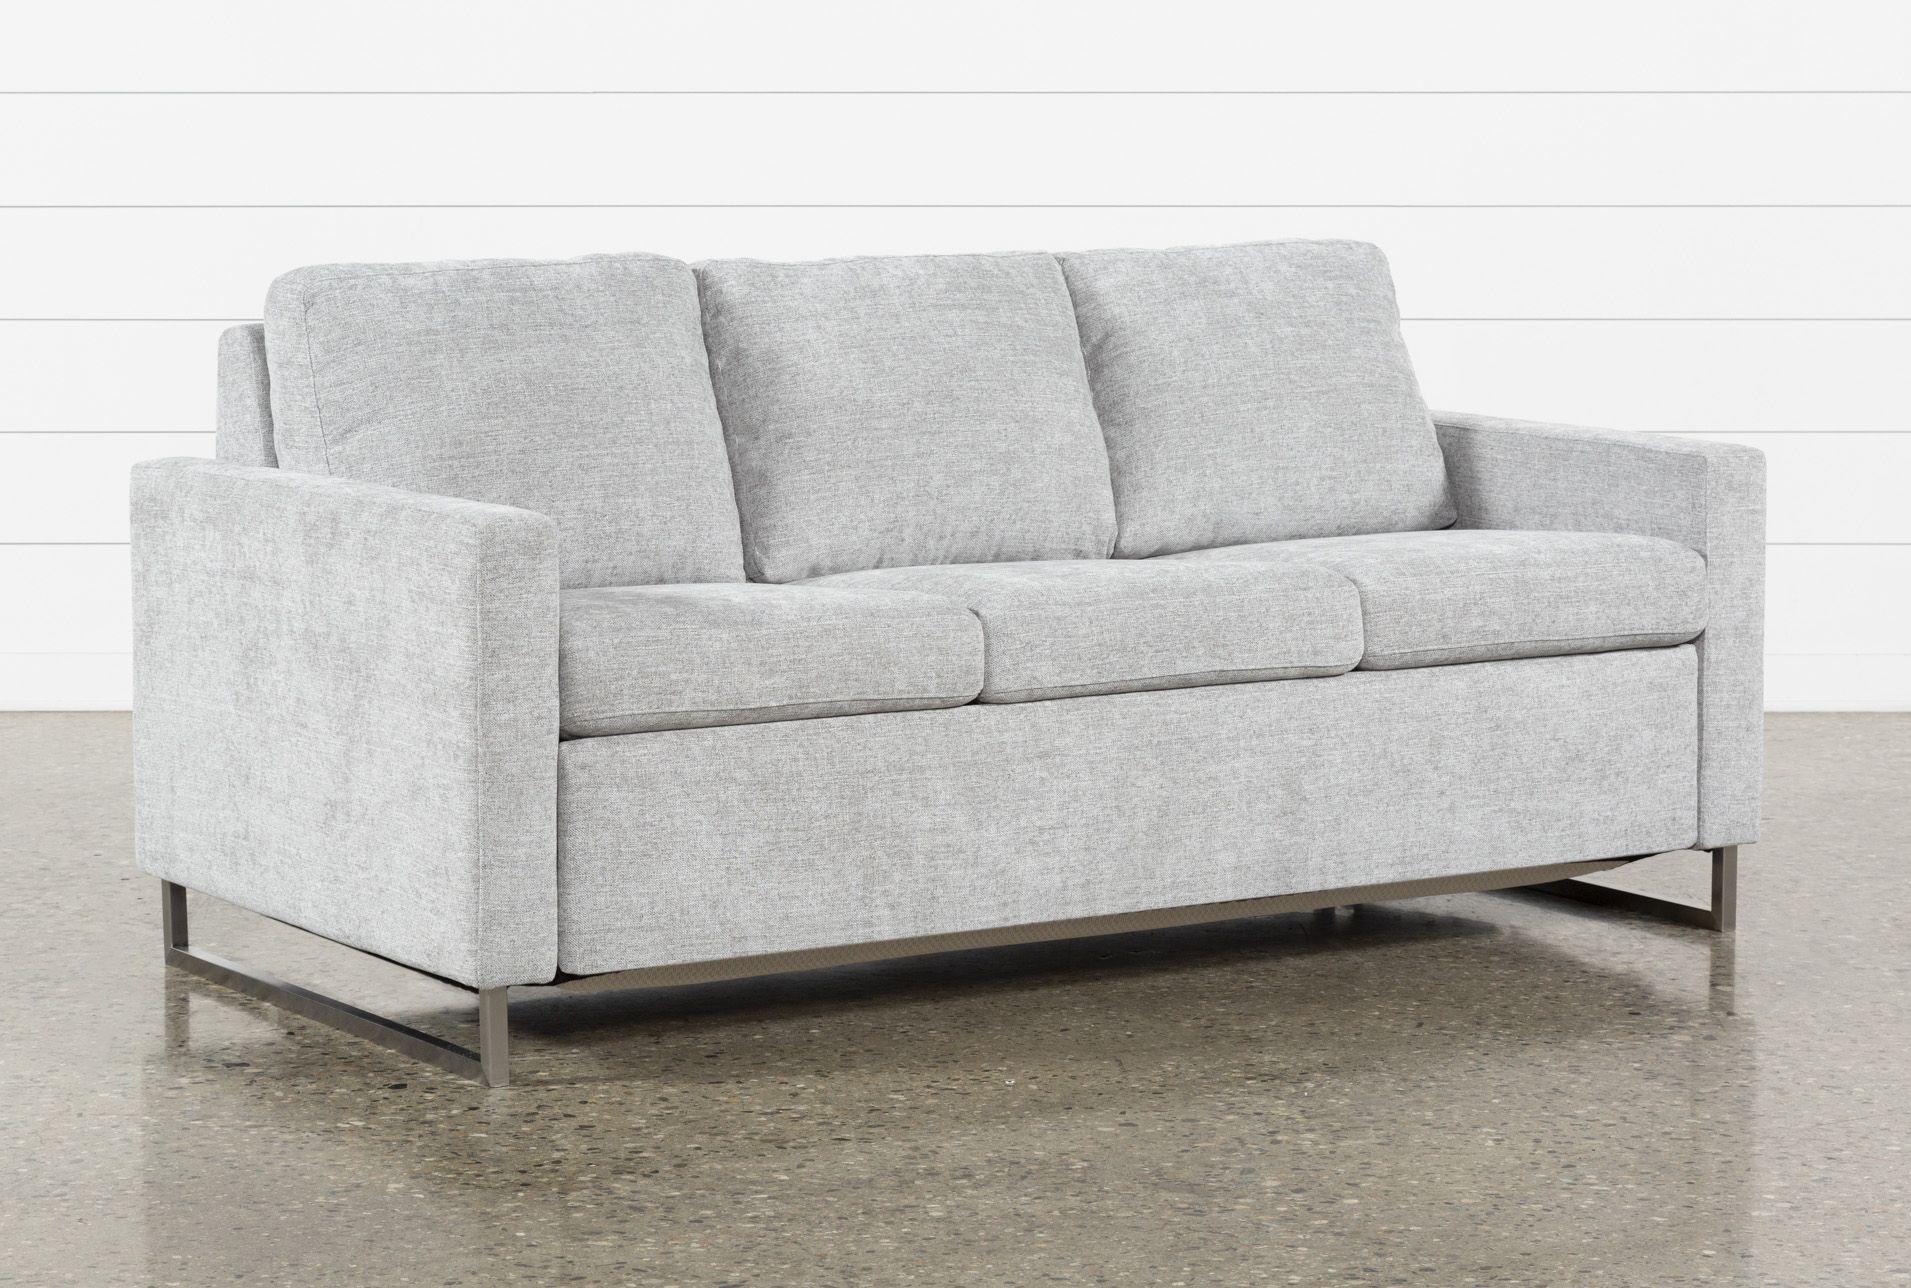 Best Branson Light Grey Queen Plus Sofa Sleeper Sleeper Sofa 400 x 300